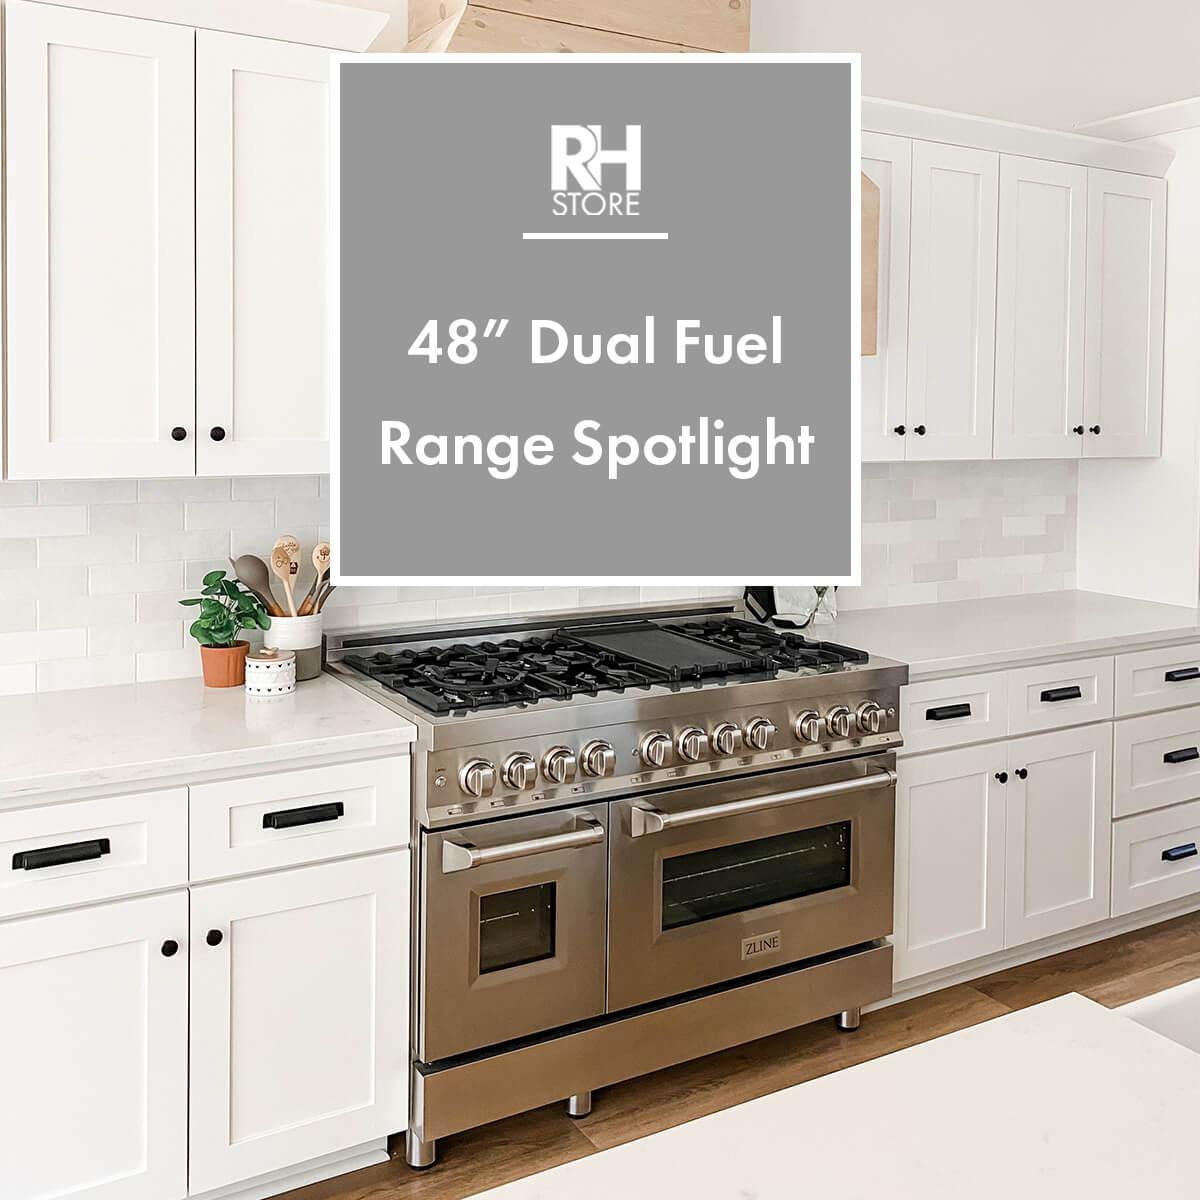 "The Best In Class - ZLINE 48"" Dual Fuel Range Spotlight"